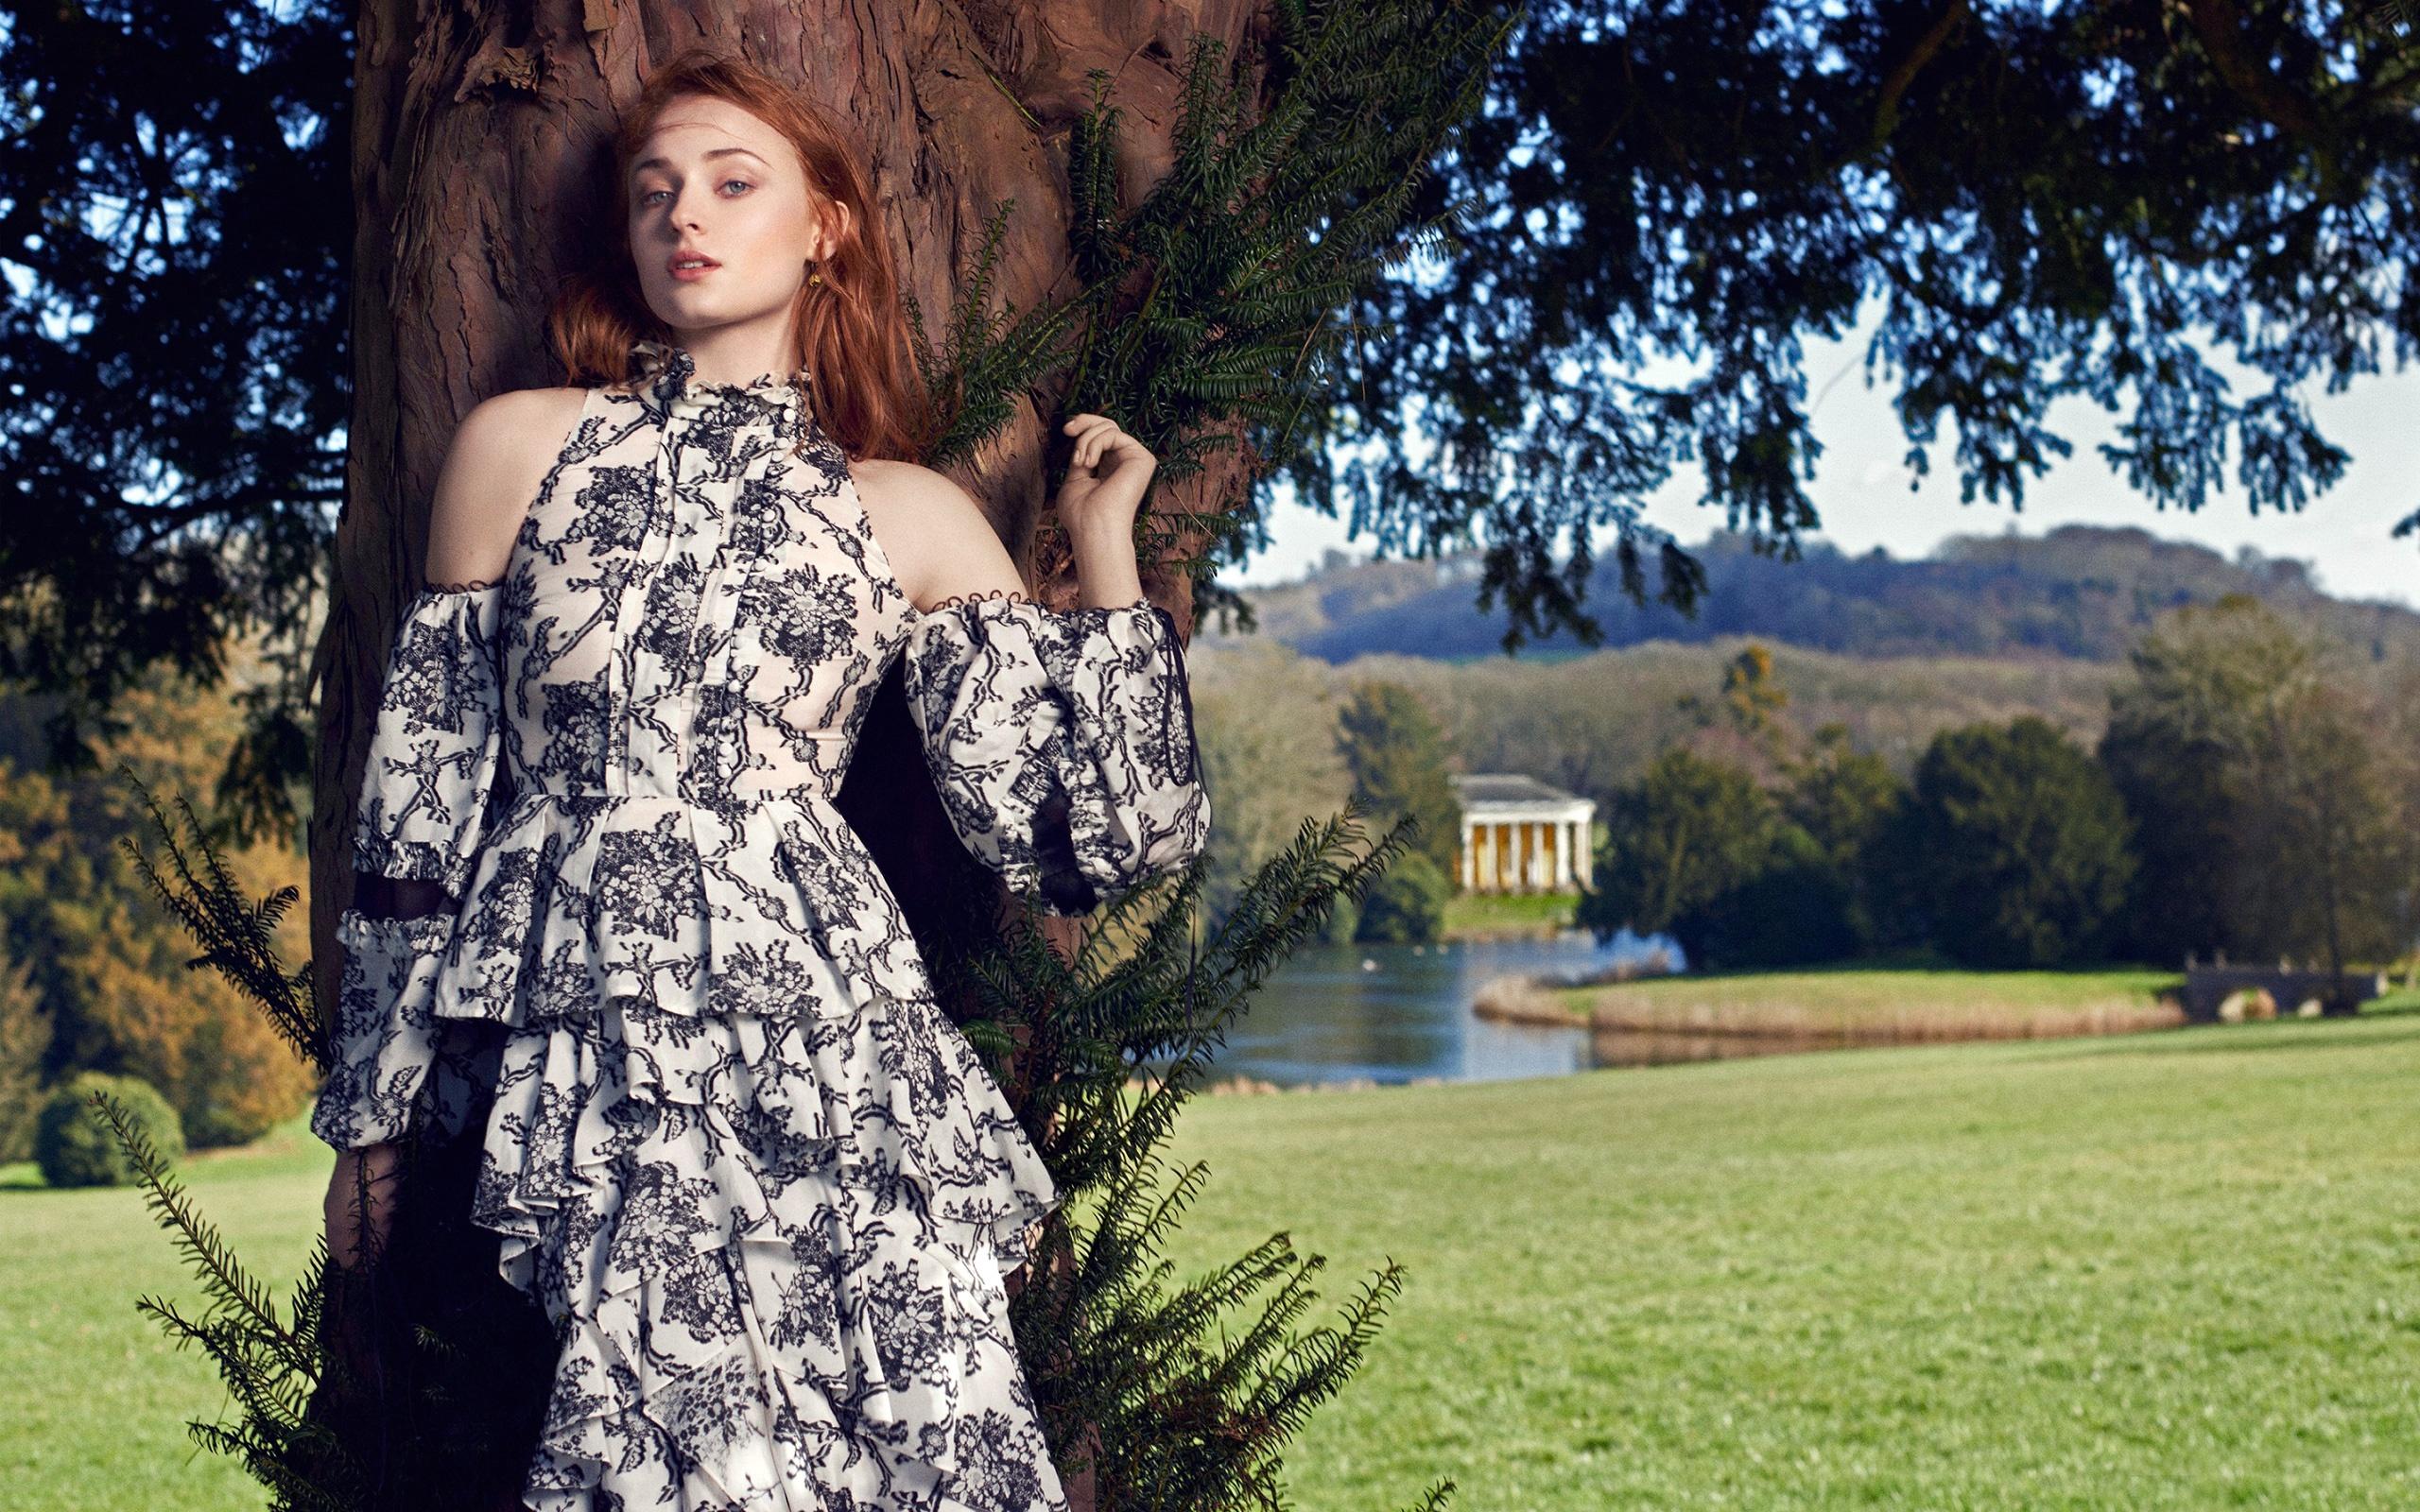 Sophie Turner Sansa Stark Wallpapers In Jpg Format For Free Download